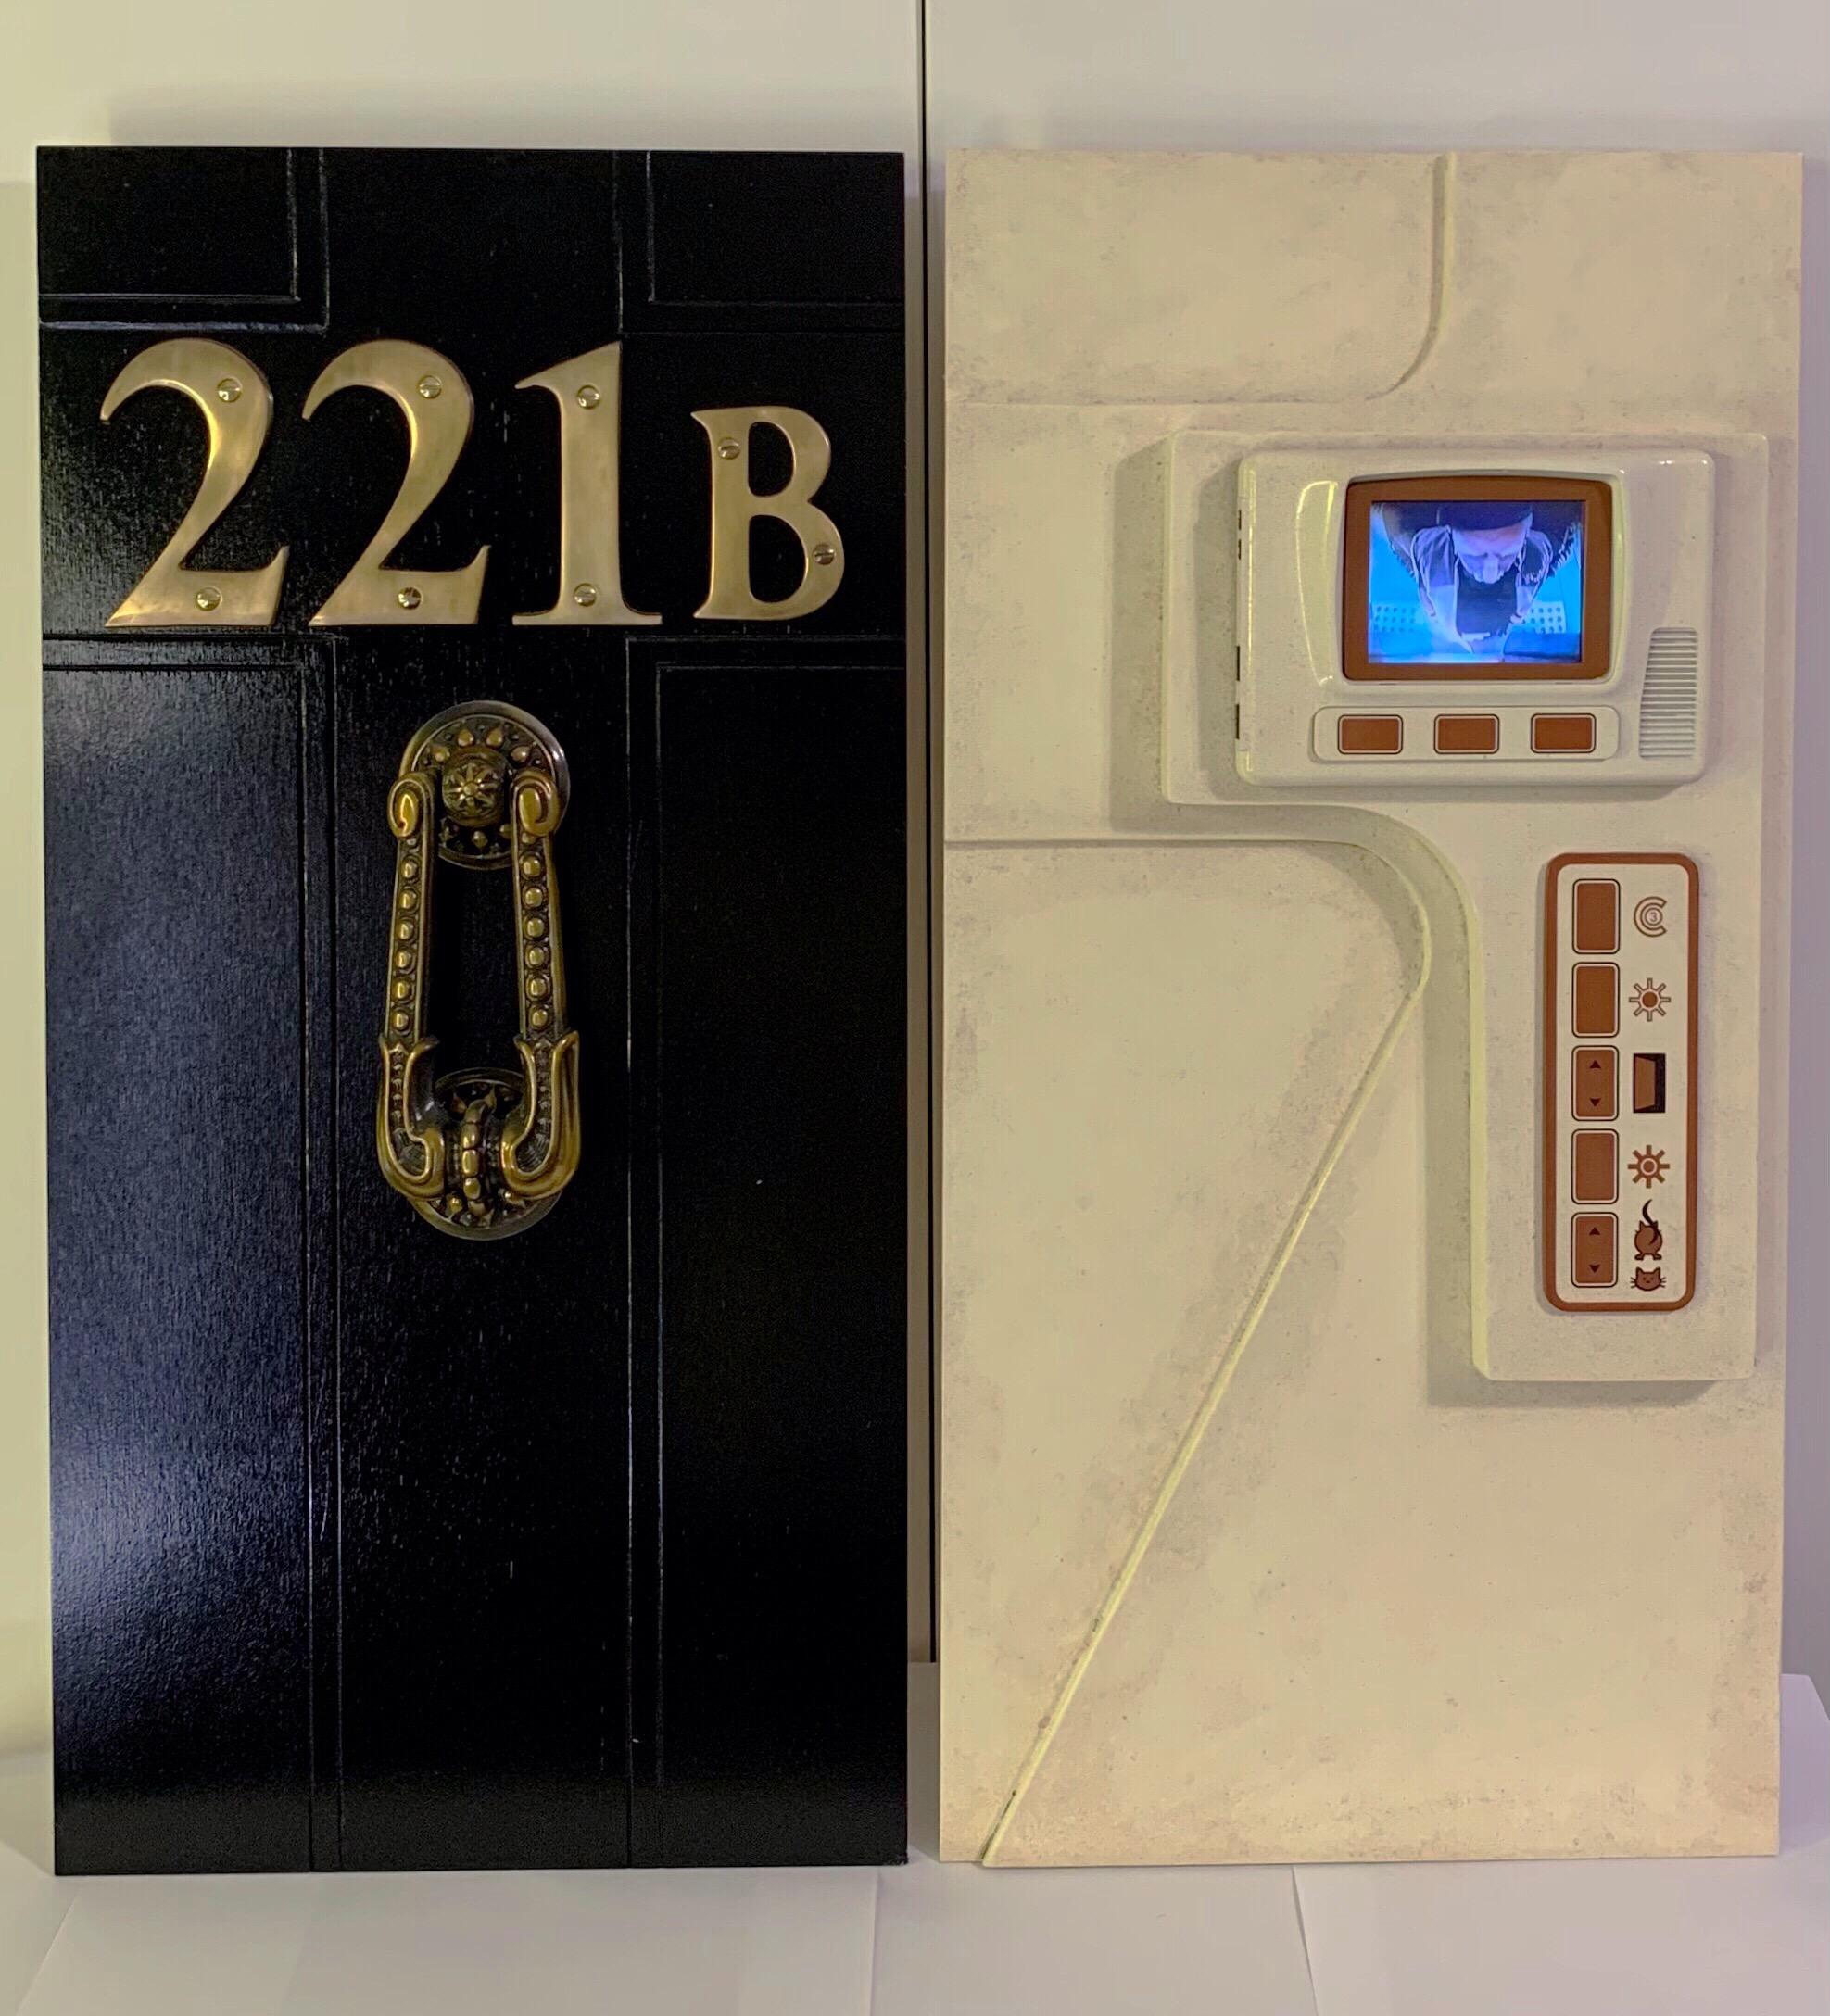 938A39A3-DAD8-4704-B750-9CDBC4F49129.jpeg